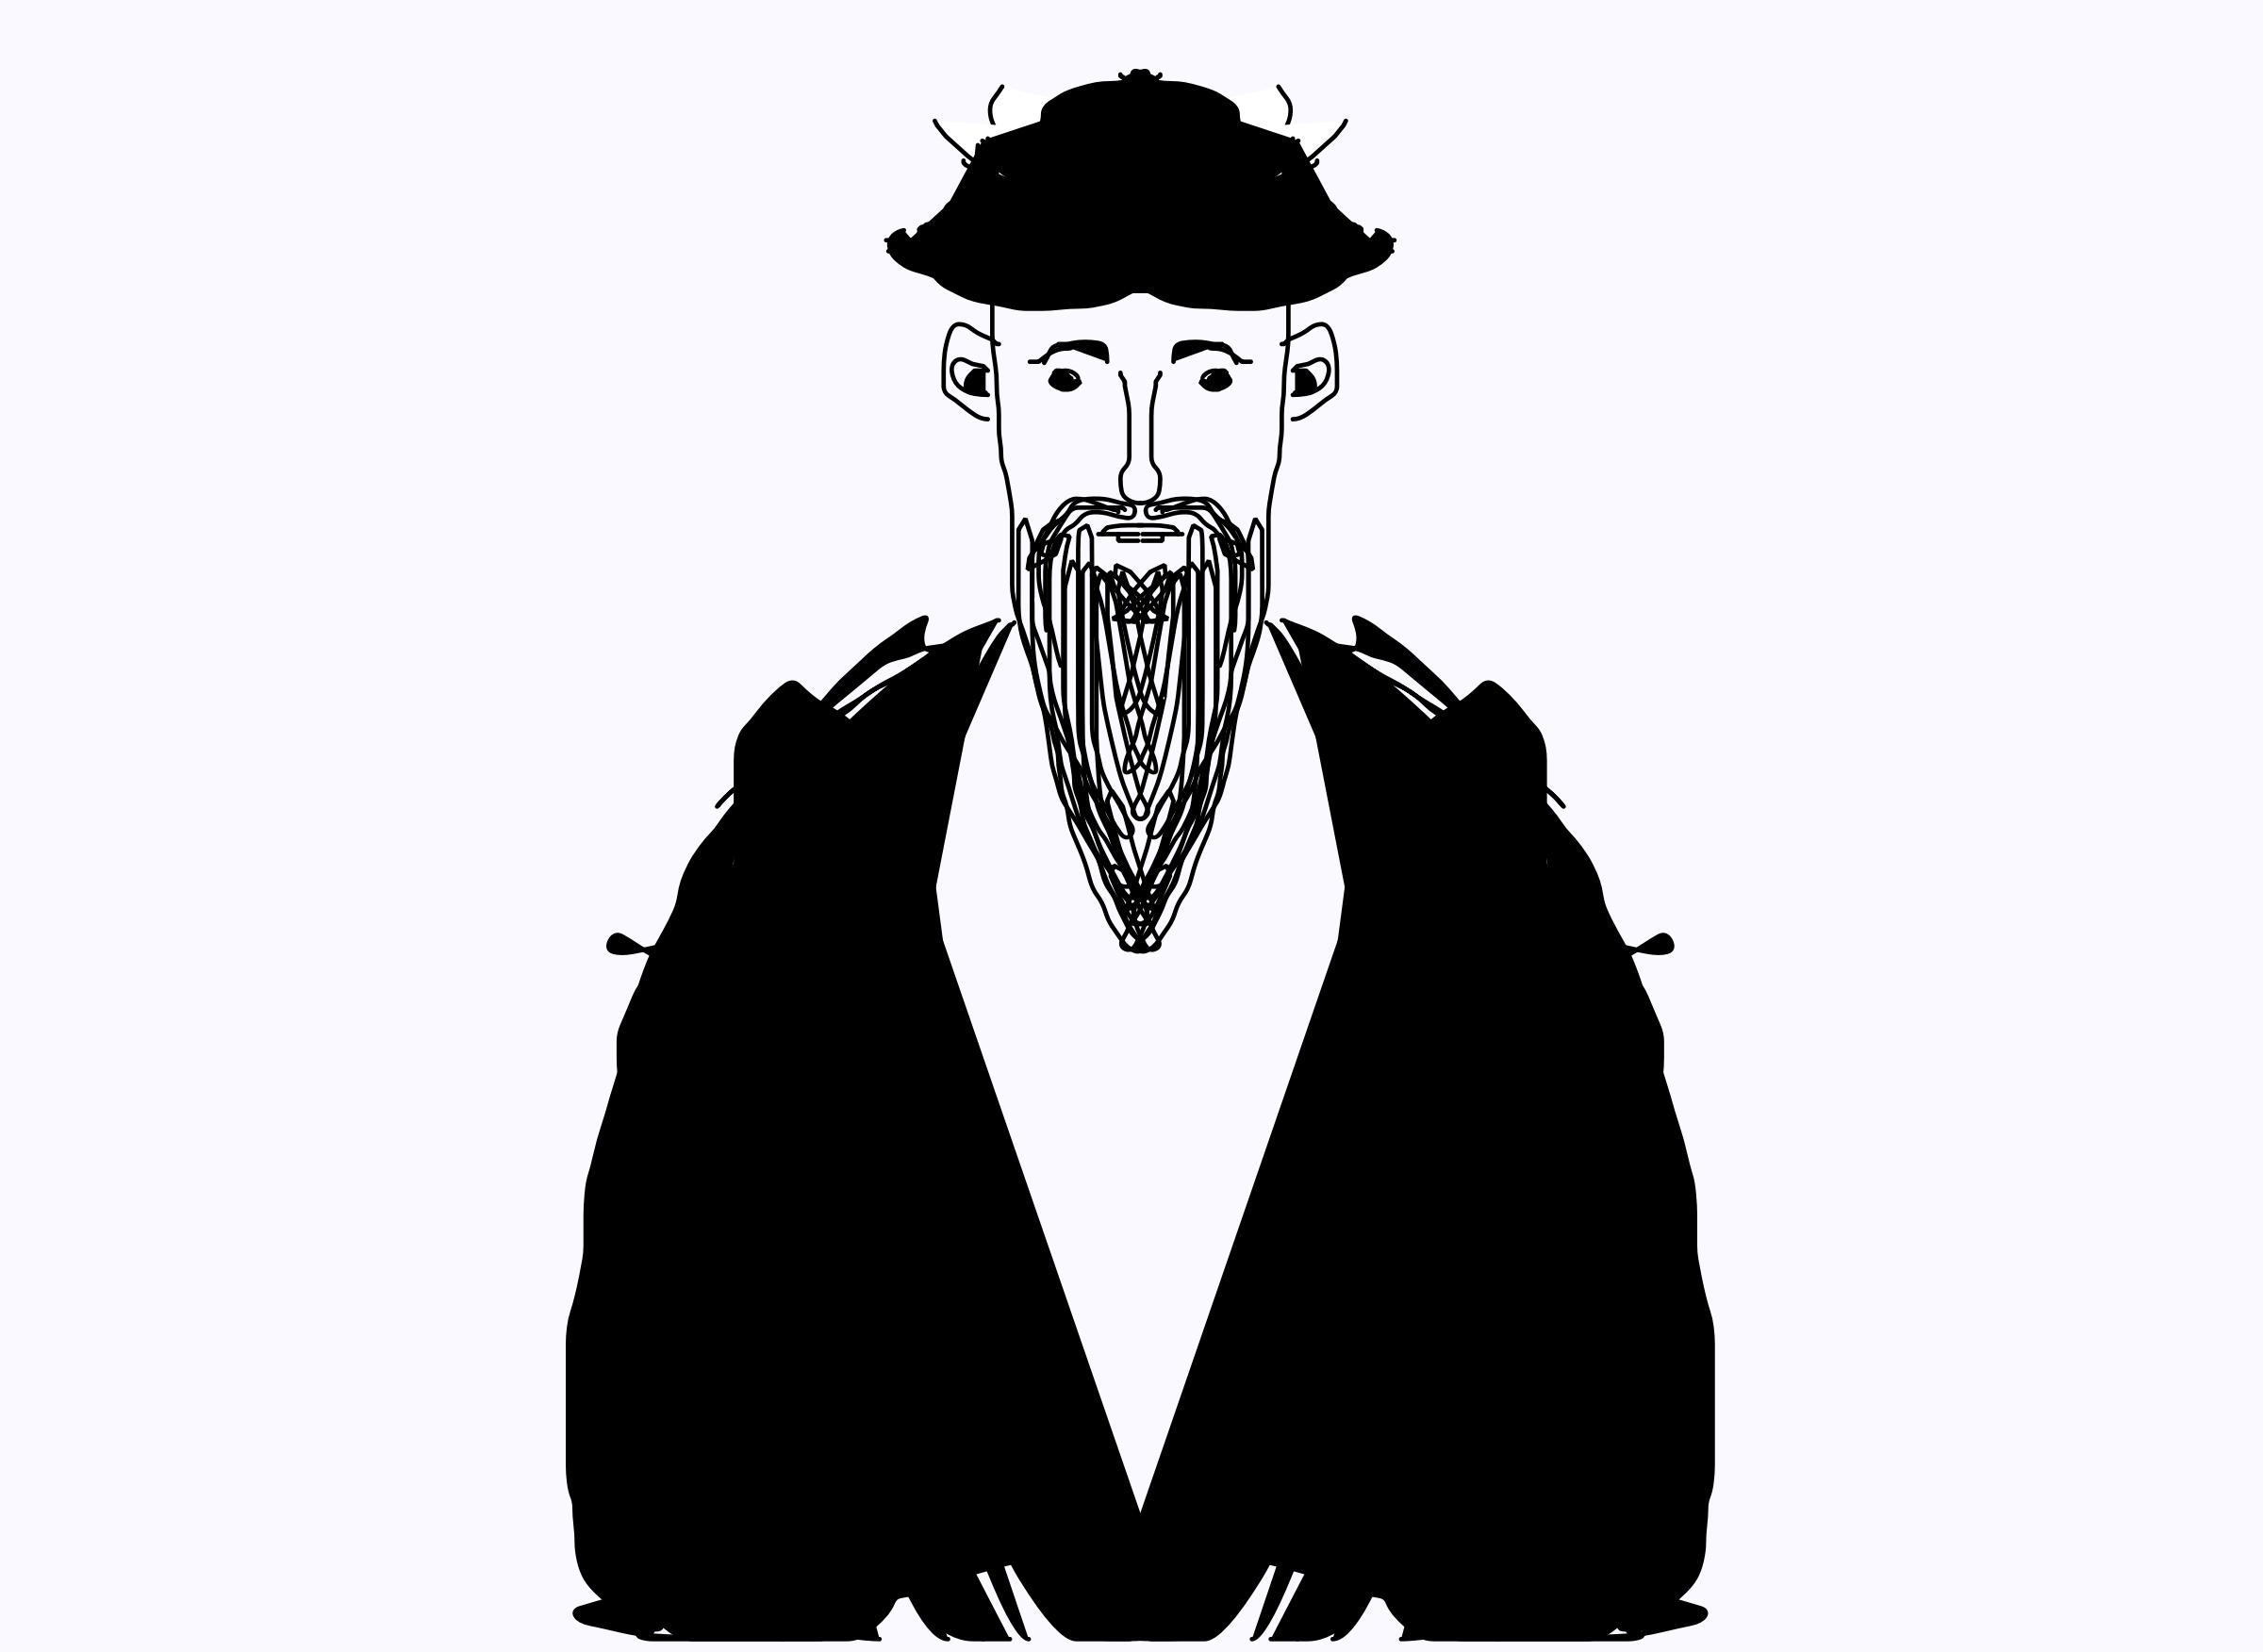 Big image png. Beard clipart rabbi